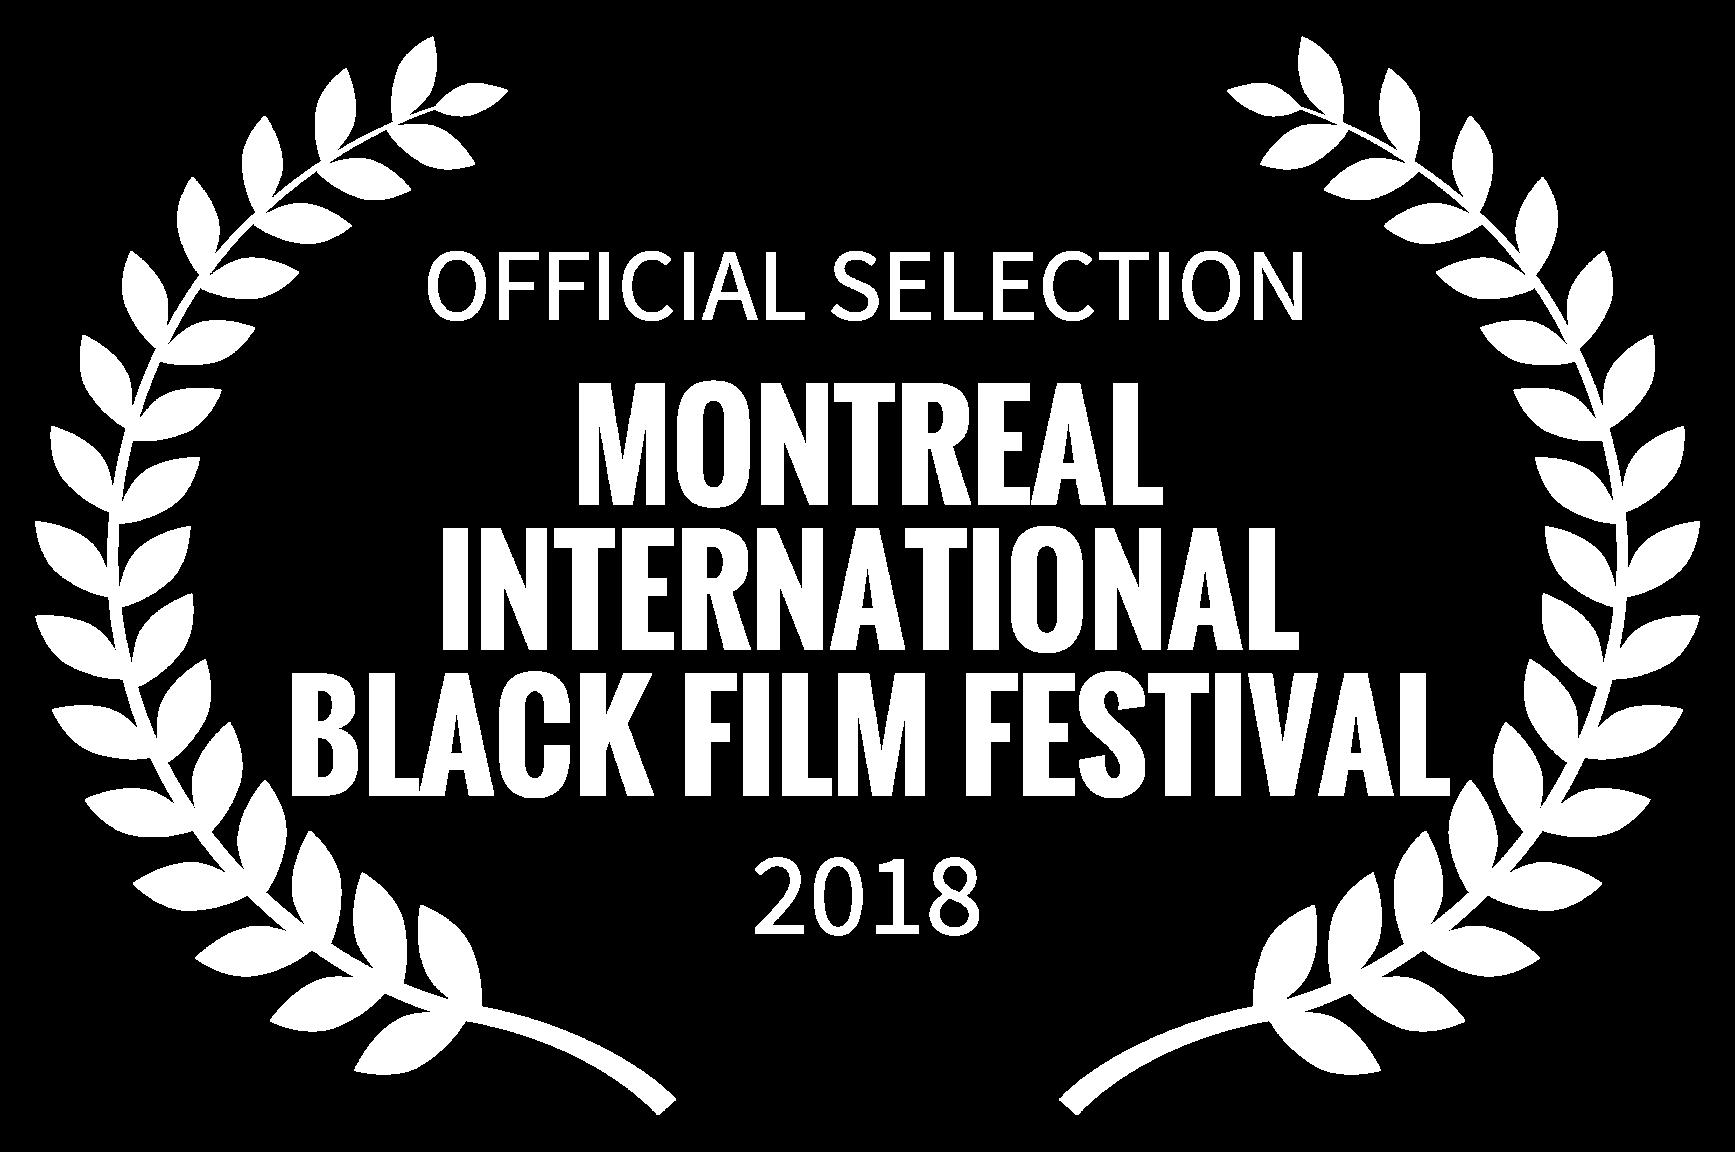 OFFICIAL SELECTION - MONTREAL INTERNATIONAL BLACK FILM FESTIVAL - 2018-2 2.png